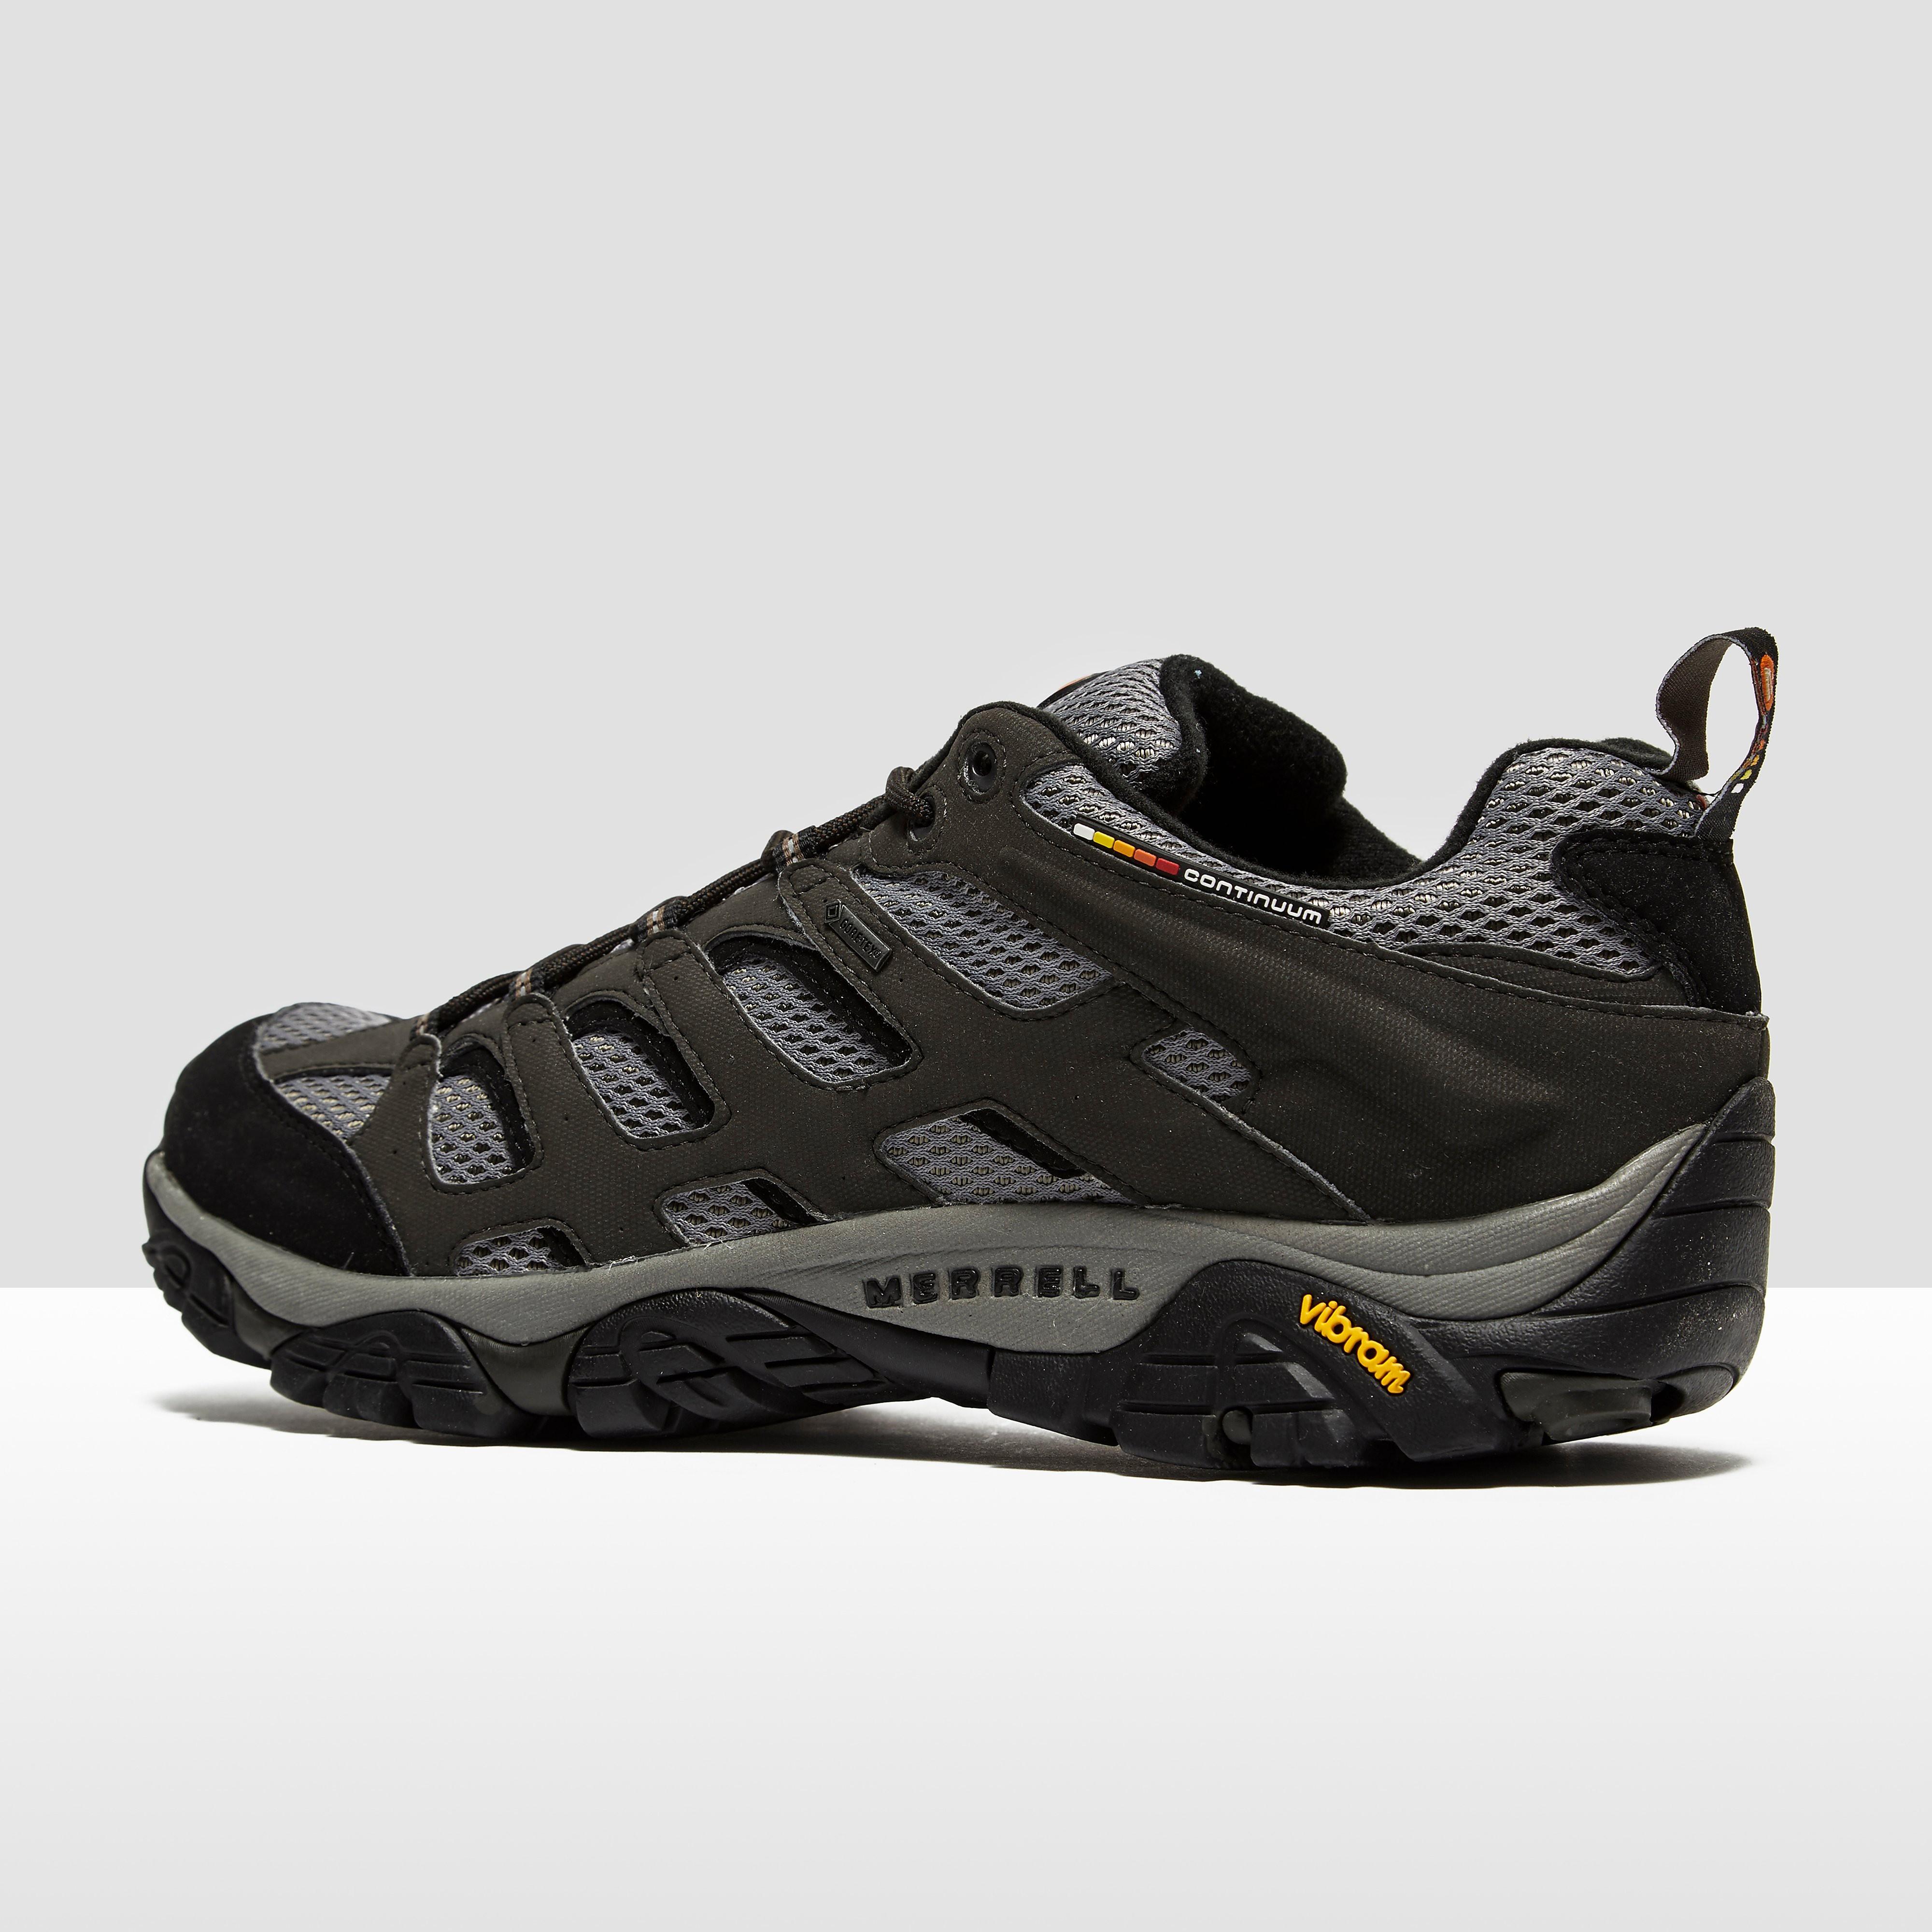 Merrell Men's Moab Gore-Tex Hiking Shoes